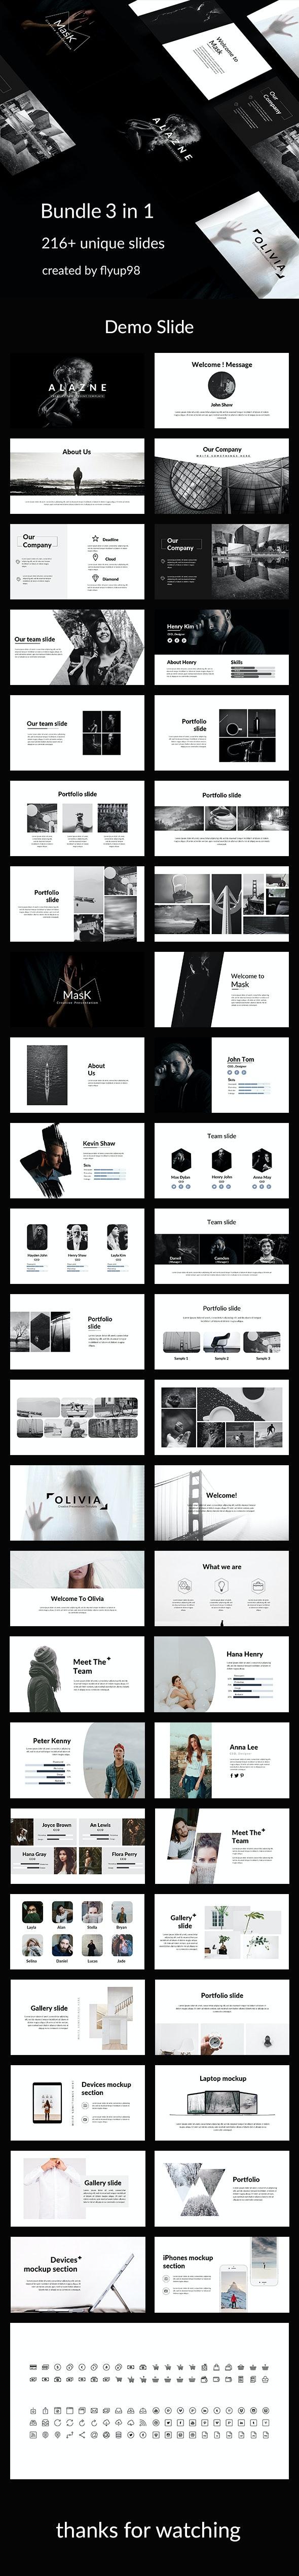 3 in 1 Premium - Feb 1 Powerpoint Template Bundle - Creative PowerPoint Templates